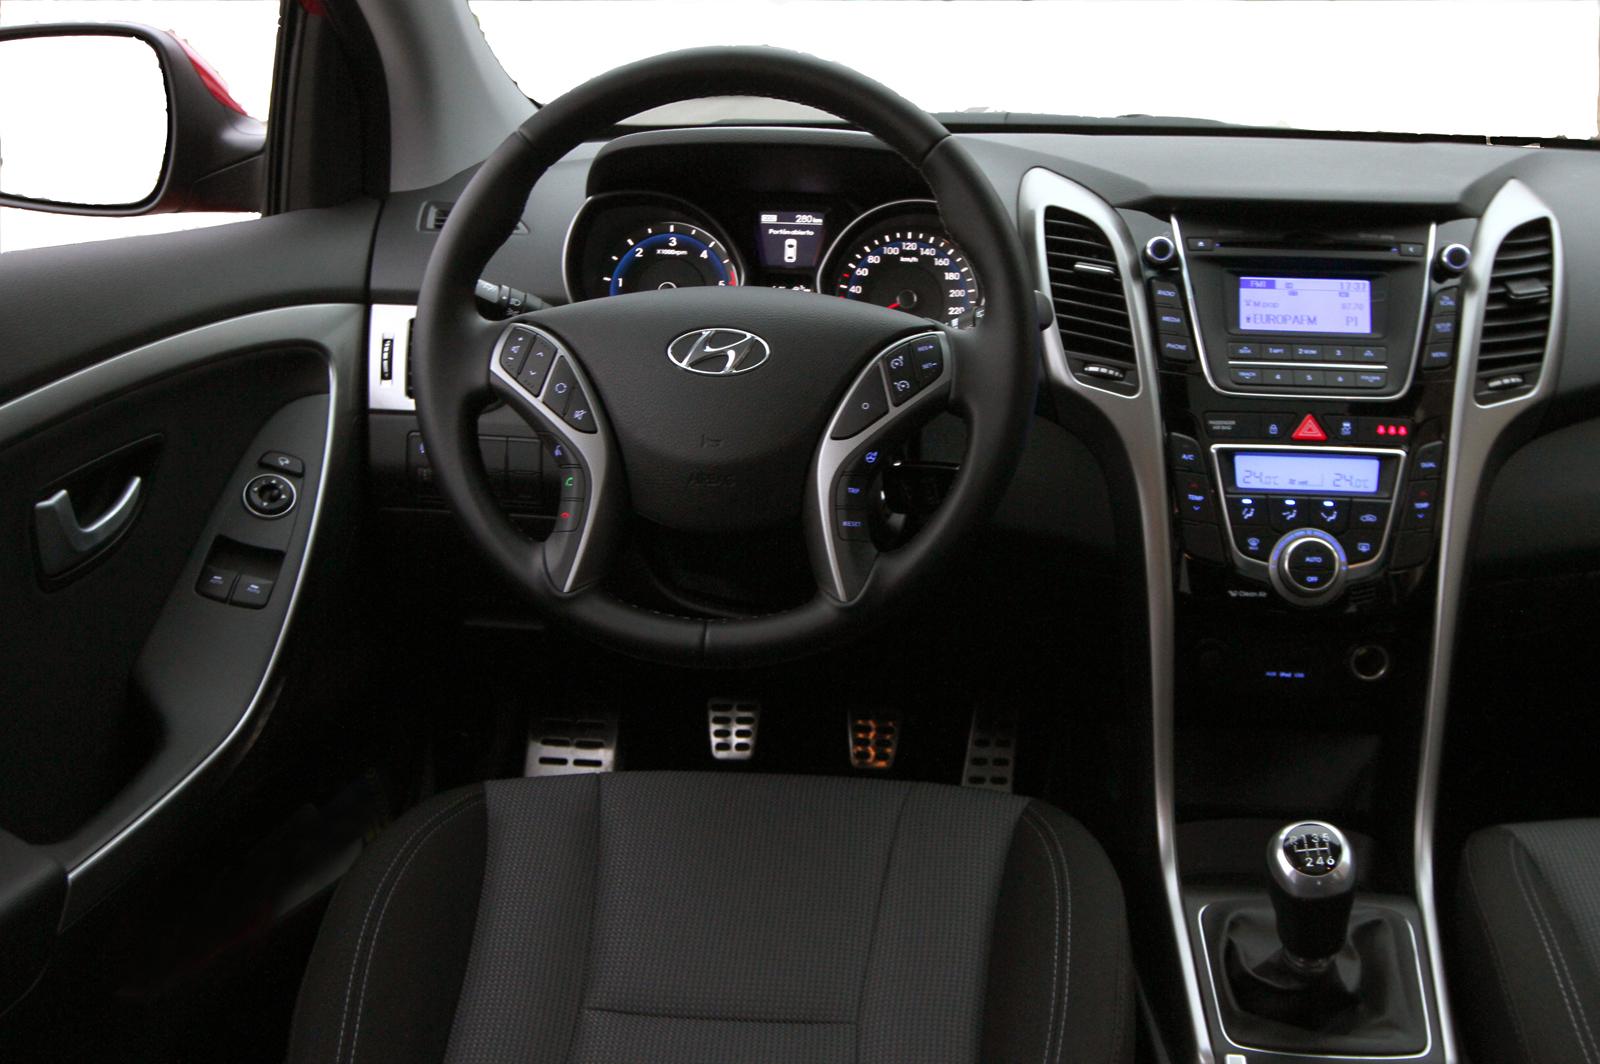 Foto Interiores 1 Hyundai I30 Cupe 2013